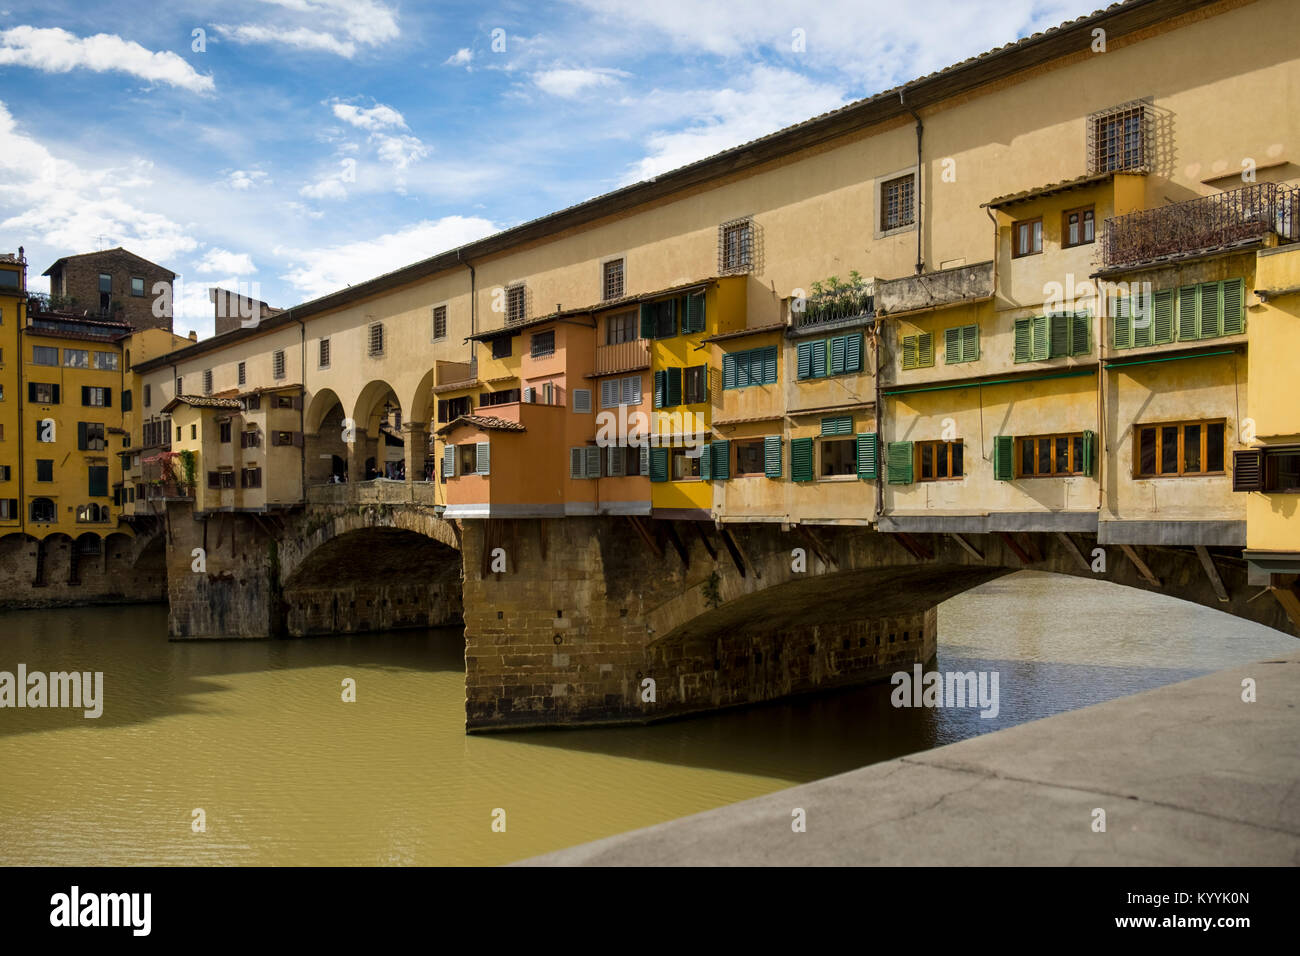 Ponte Vecchio bridge in Florence city, Italy, Europe - Stock Image